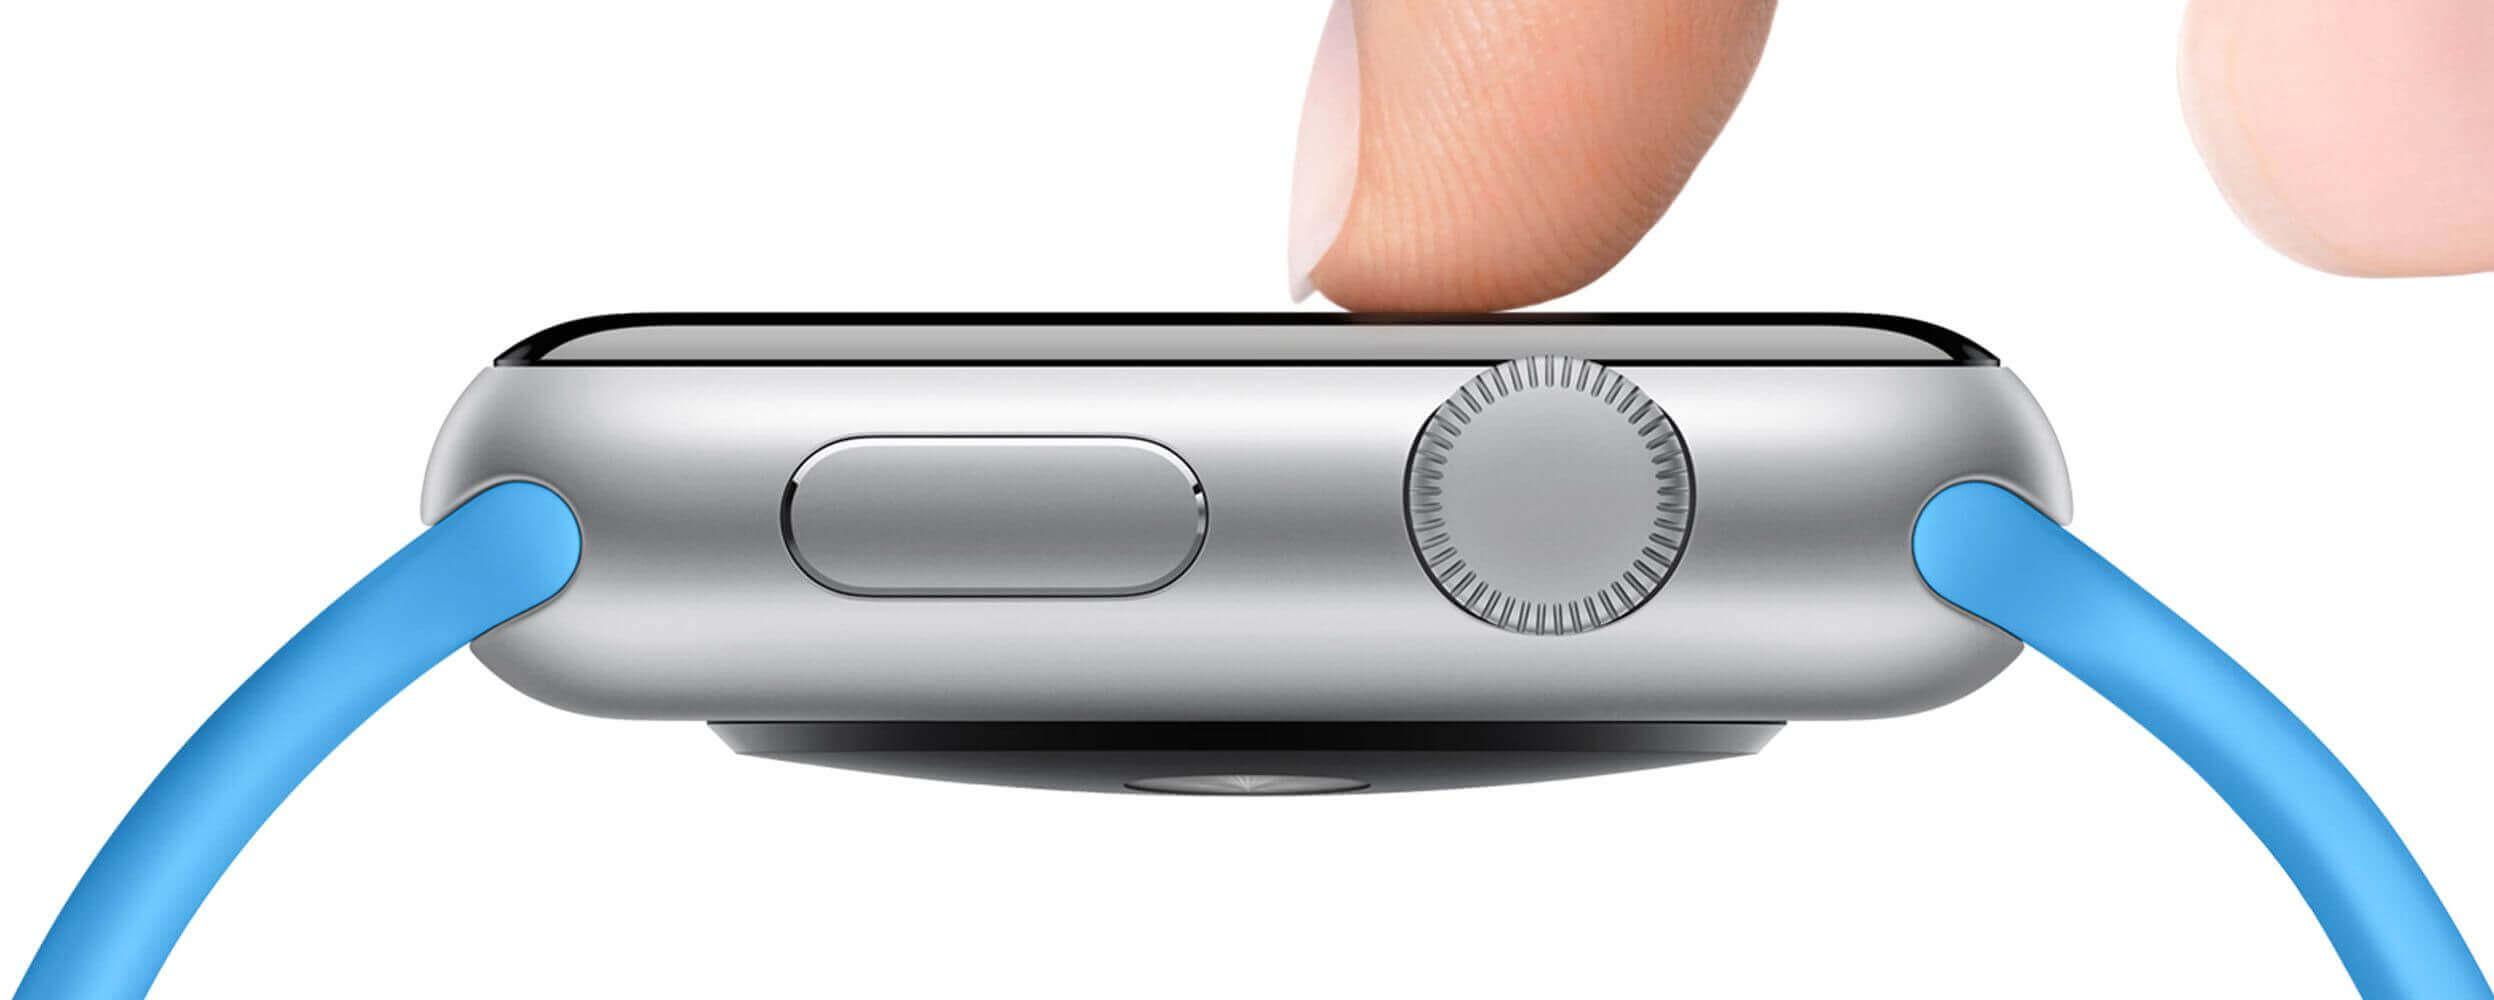 Apple-Watch-UI Design